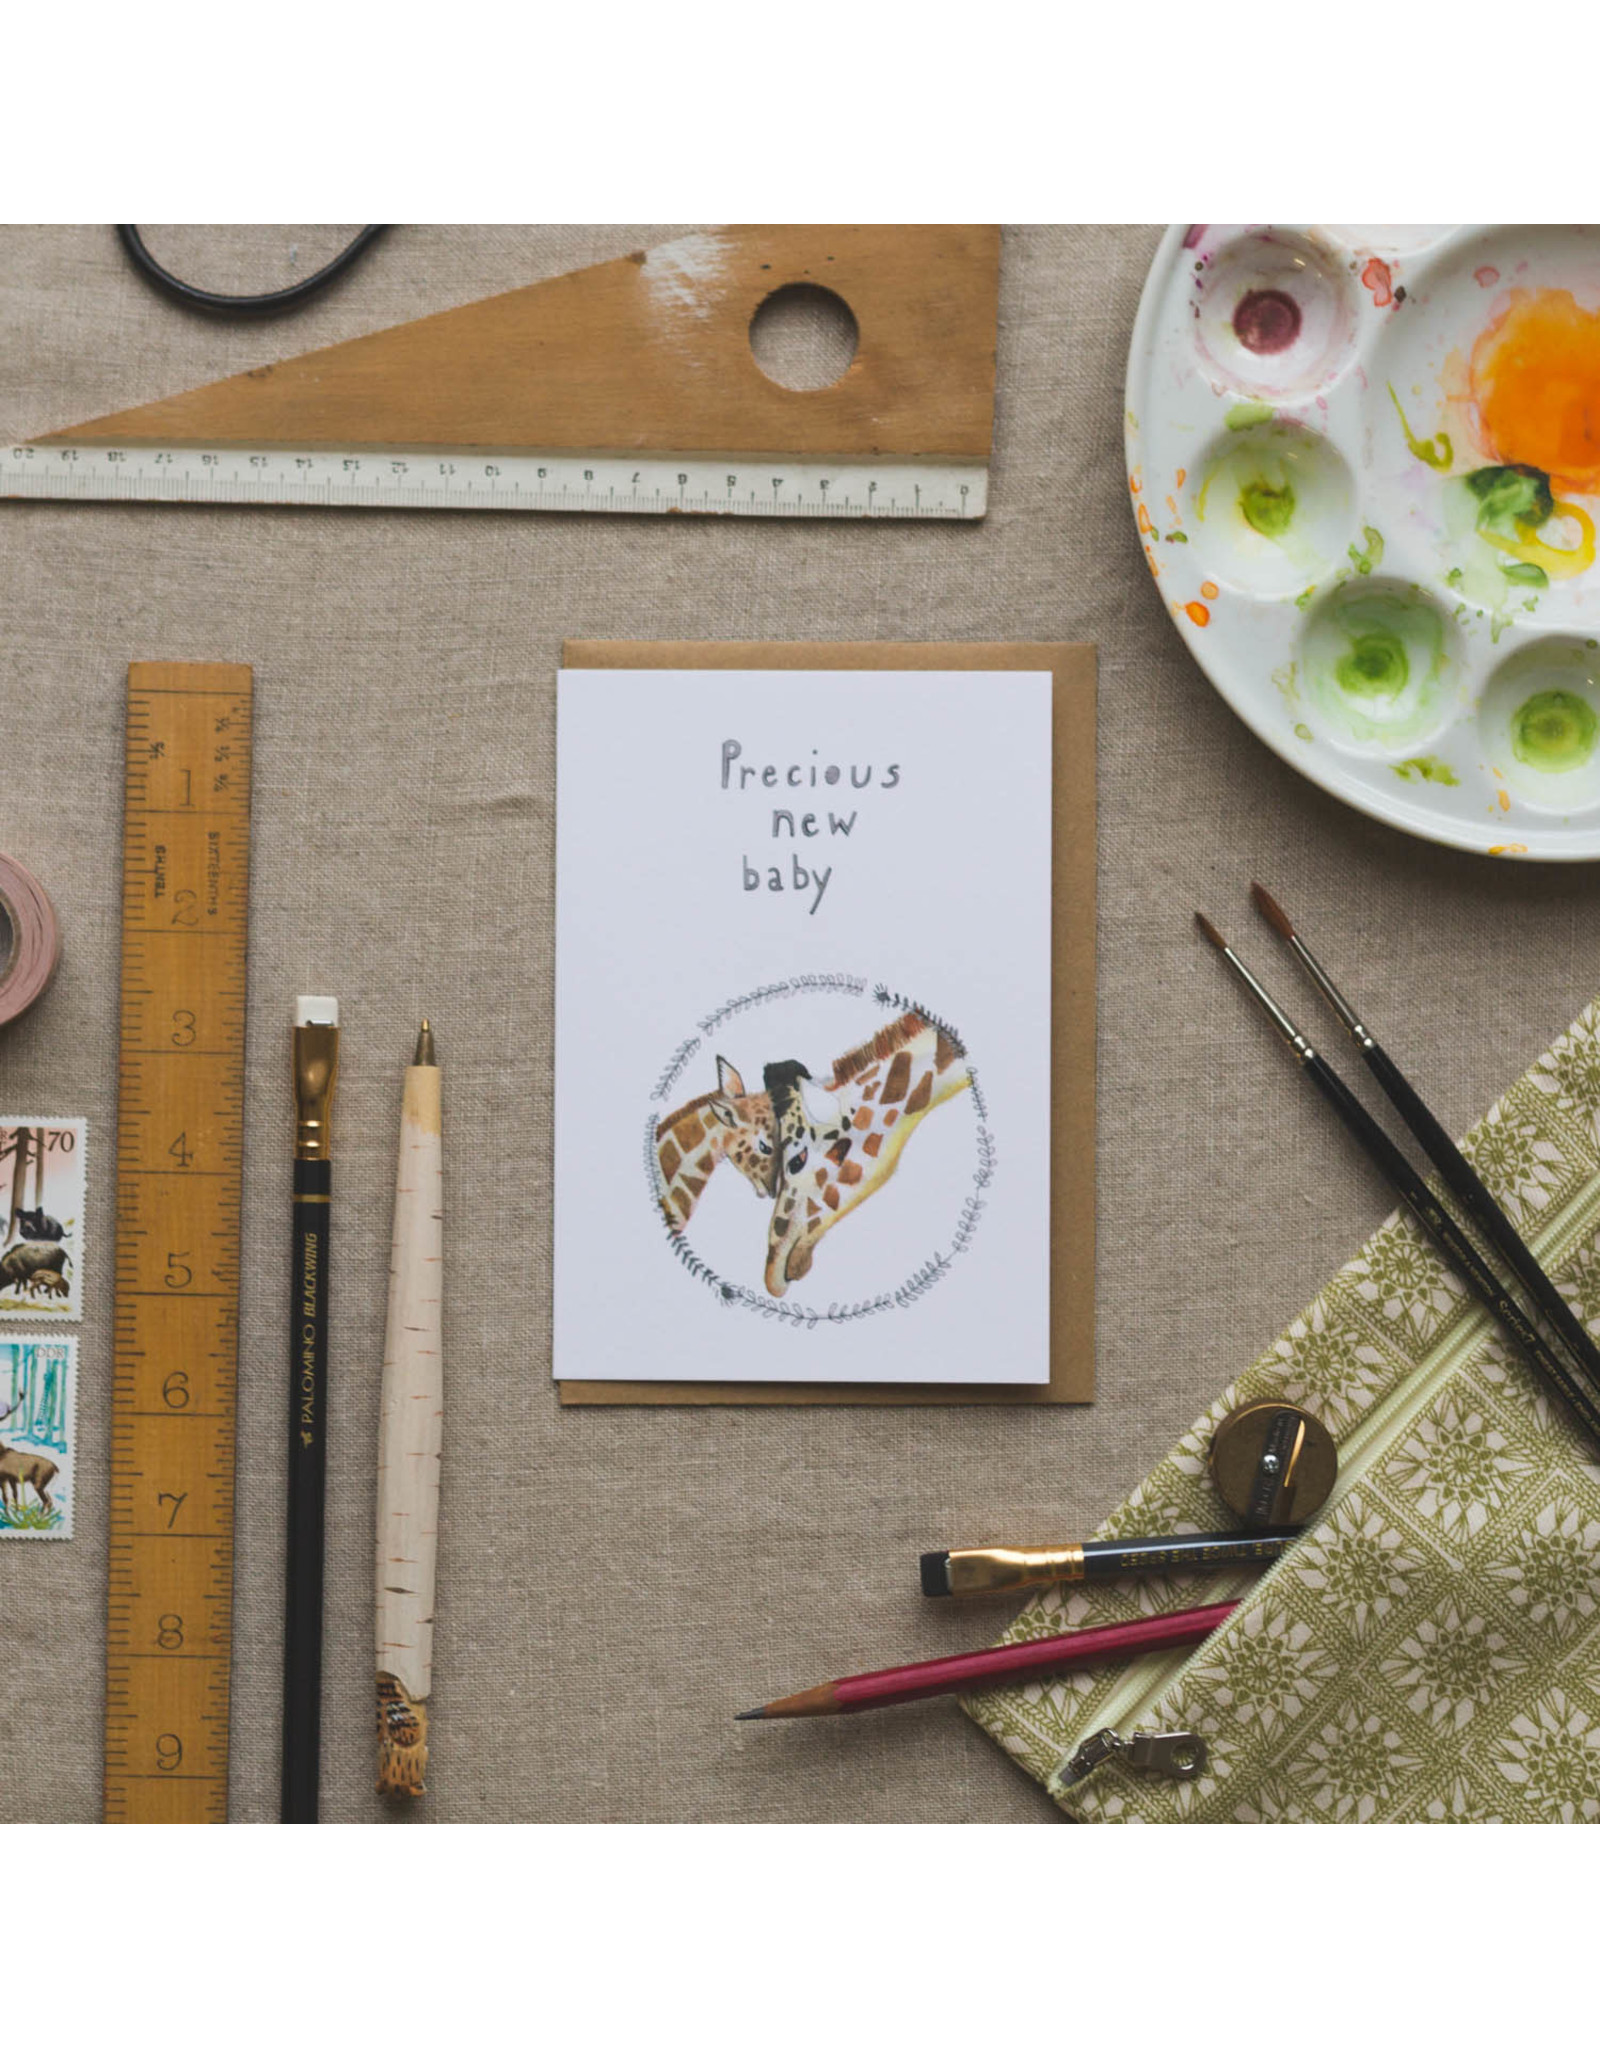 Dear Prudence Wenskaart - Precious new baby  - Dubbele kaart + Envelope - 10 x 15cm